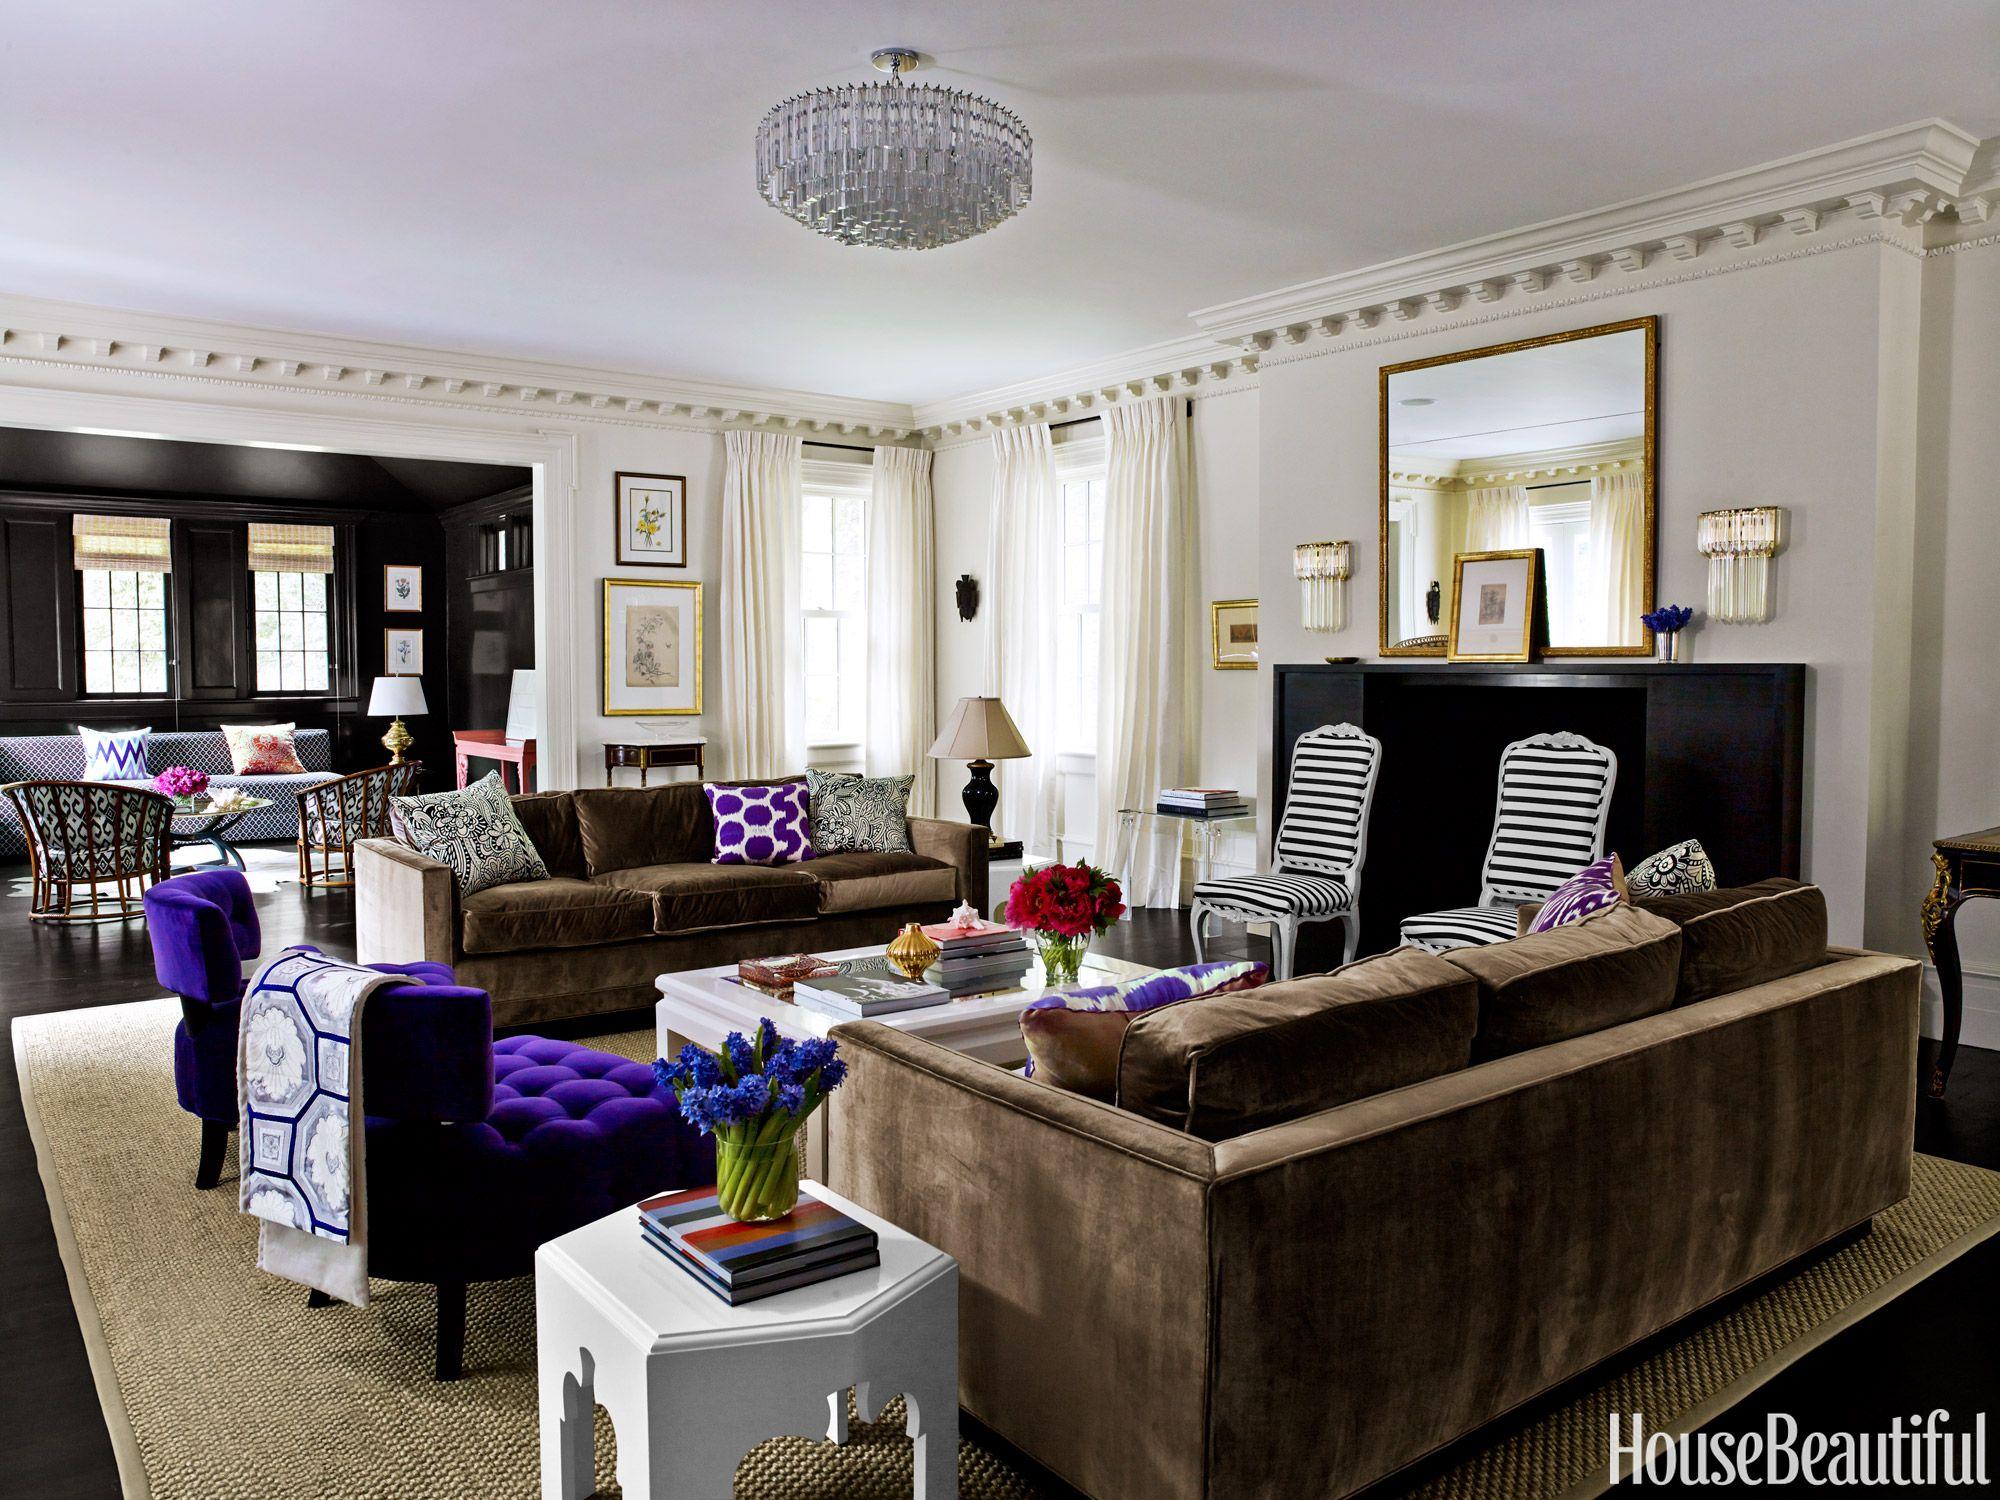 purple house design mary mcgee interior design - Purple House Interior